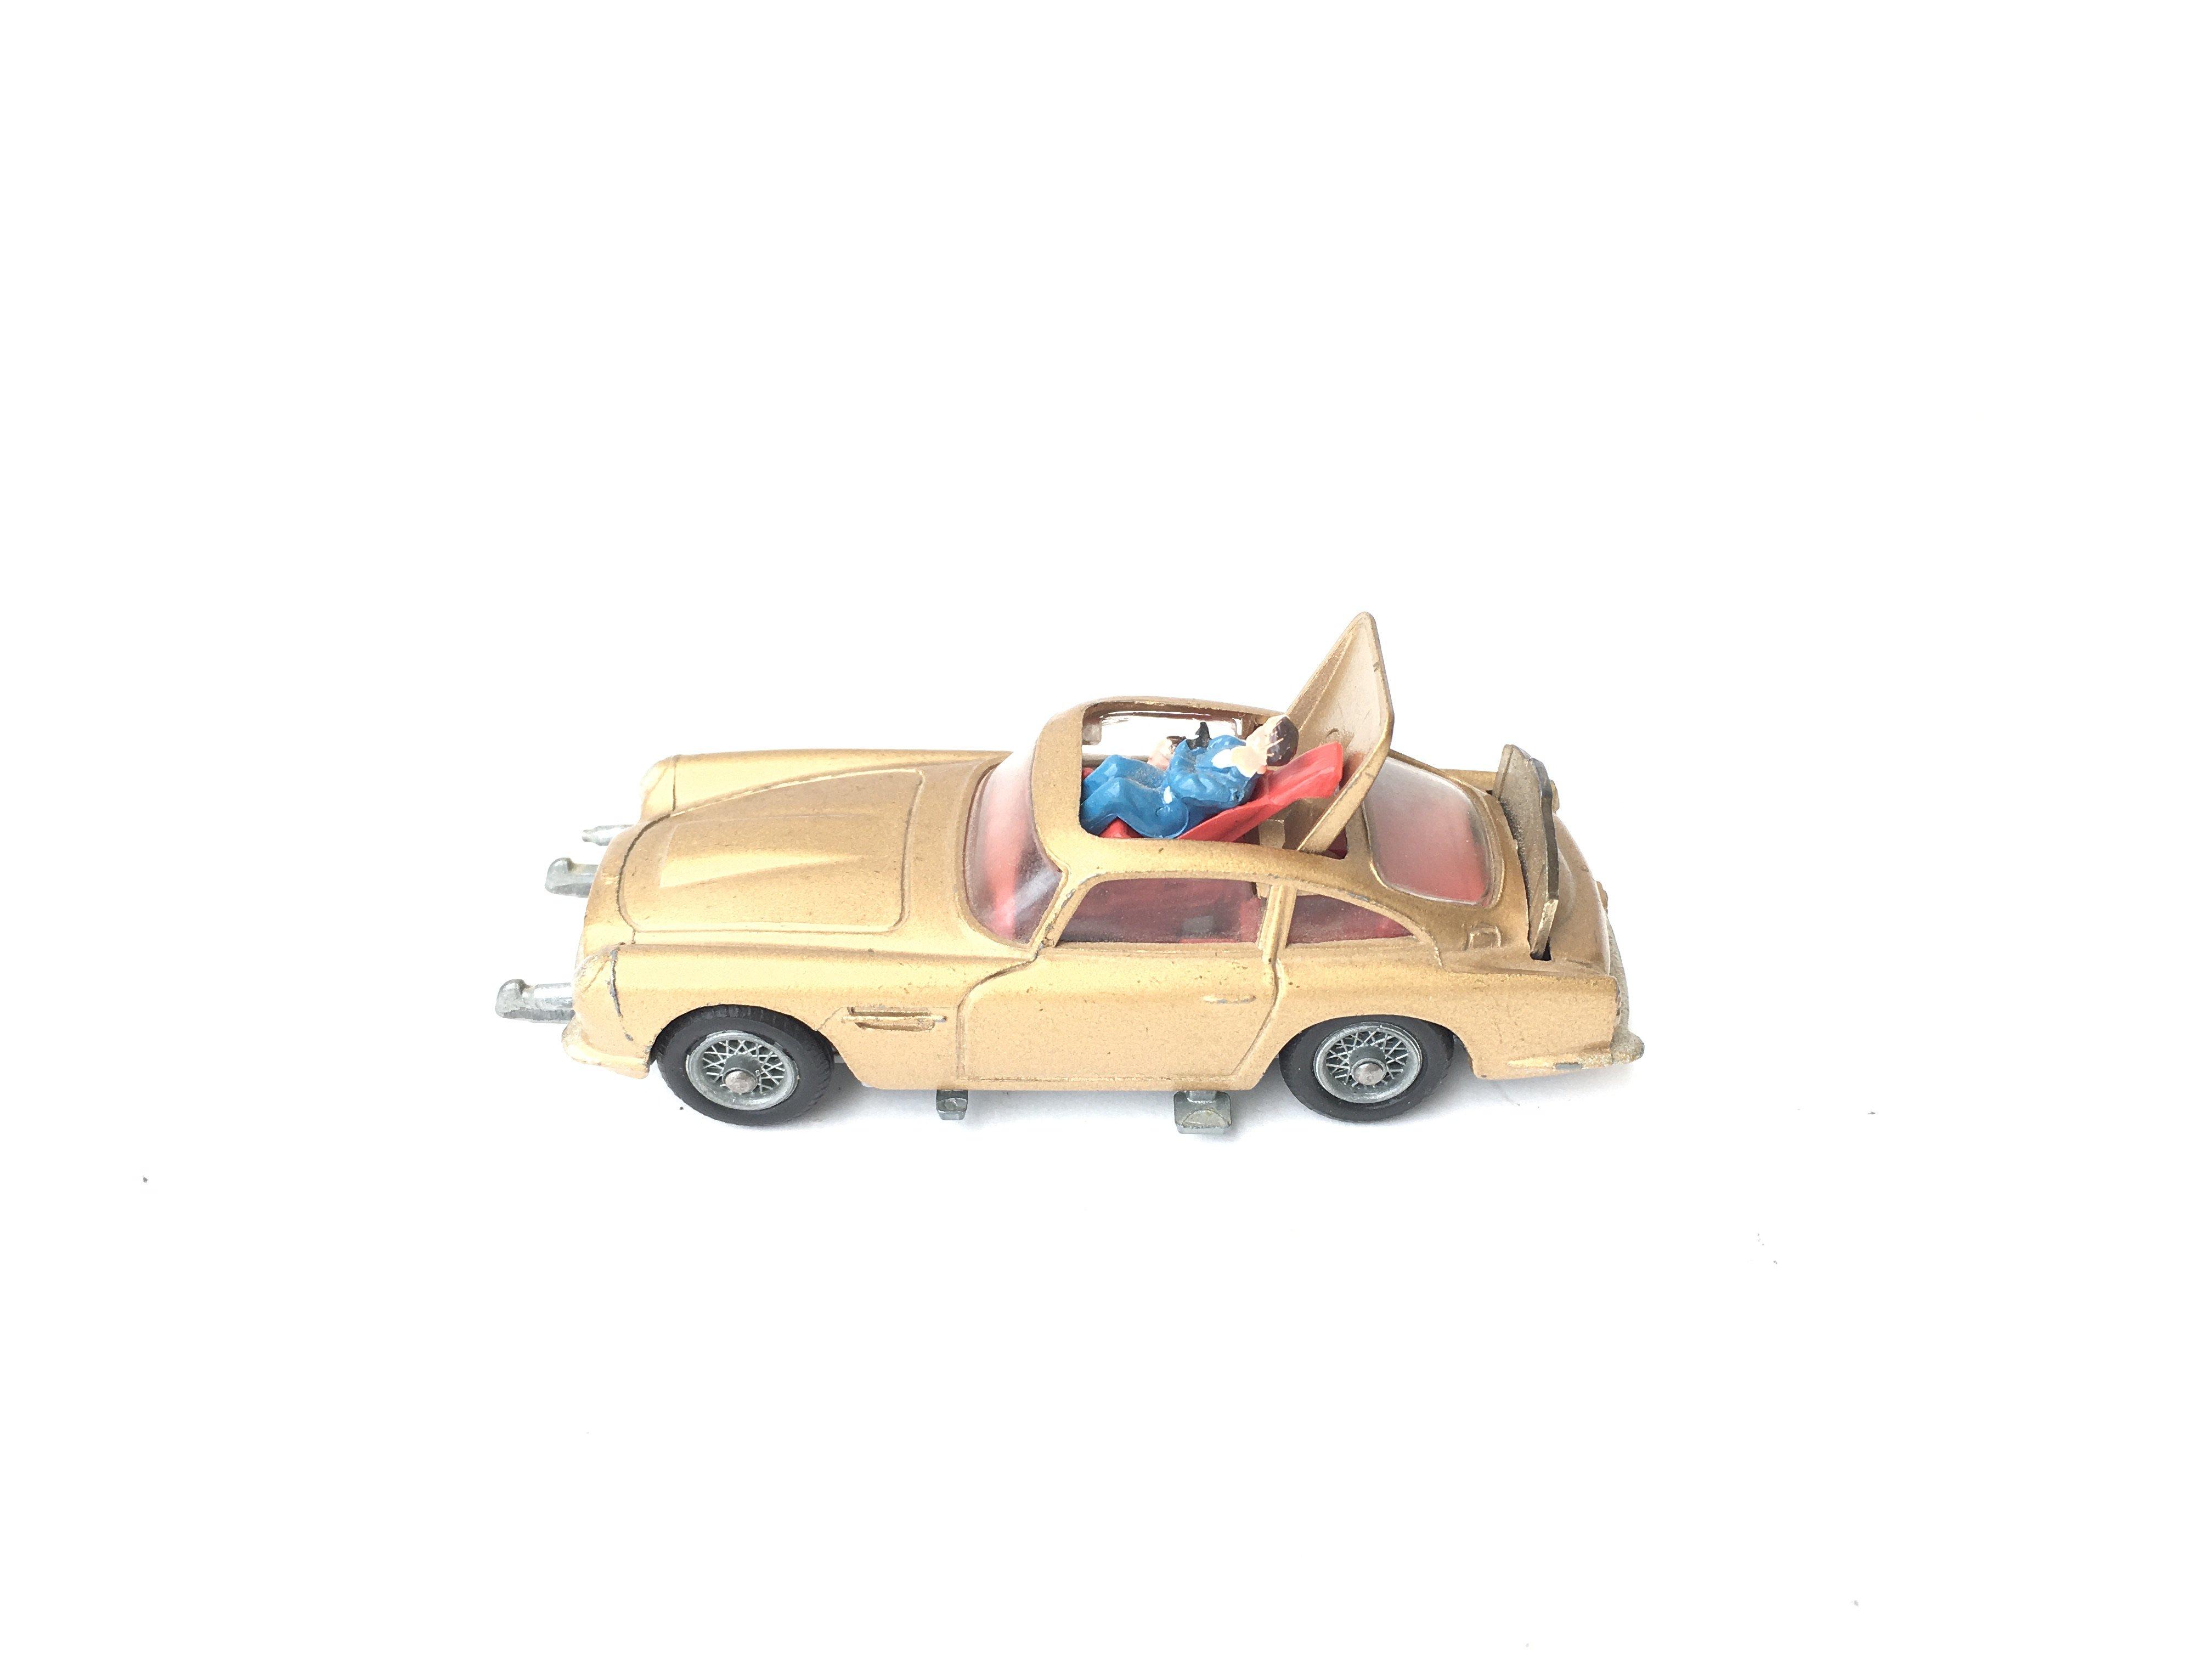 A Boxed Corgi James Bond Aston Martin D.B.5 #261. - Image 5 of 5